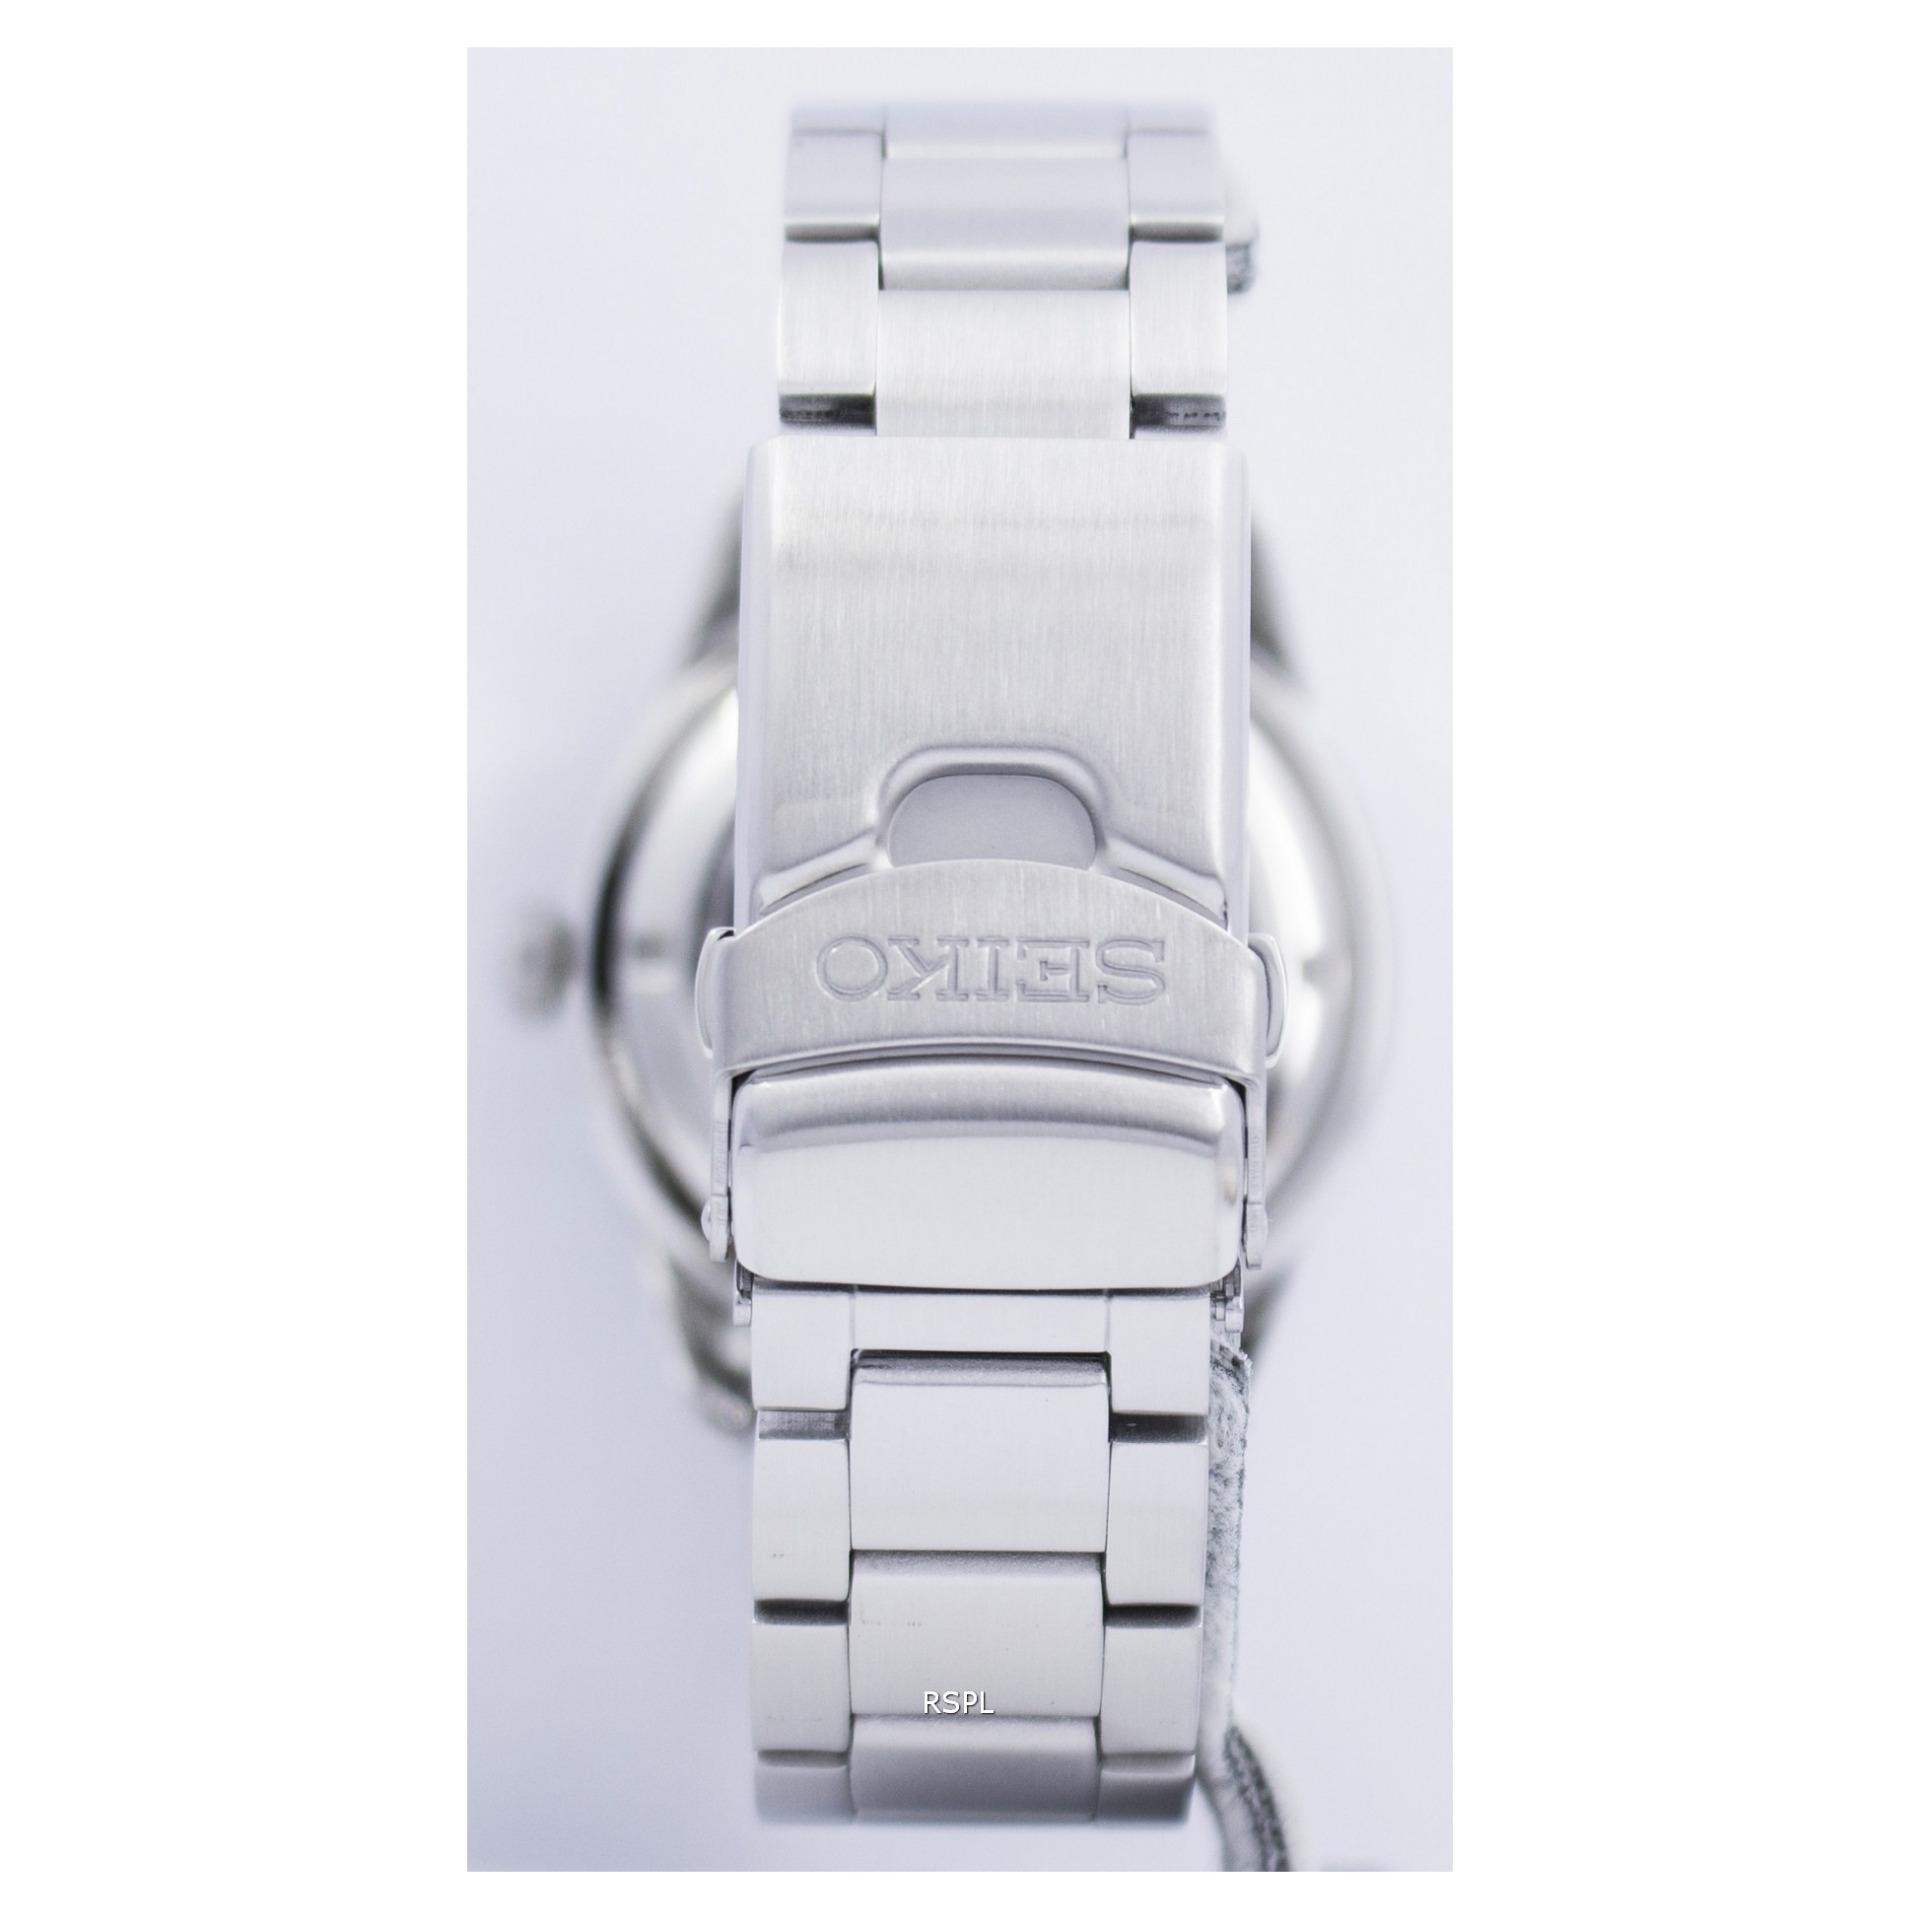 Seiko 5 Jam Tangan Pria Snzj39k1 Automatic Stainless Steel Silver Chronograph Strap Sks521p1 Stell Ssb175p1